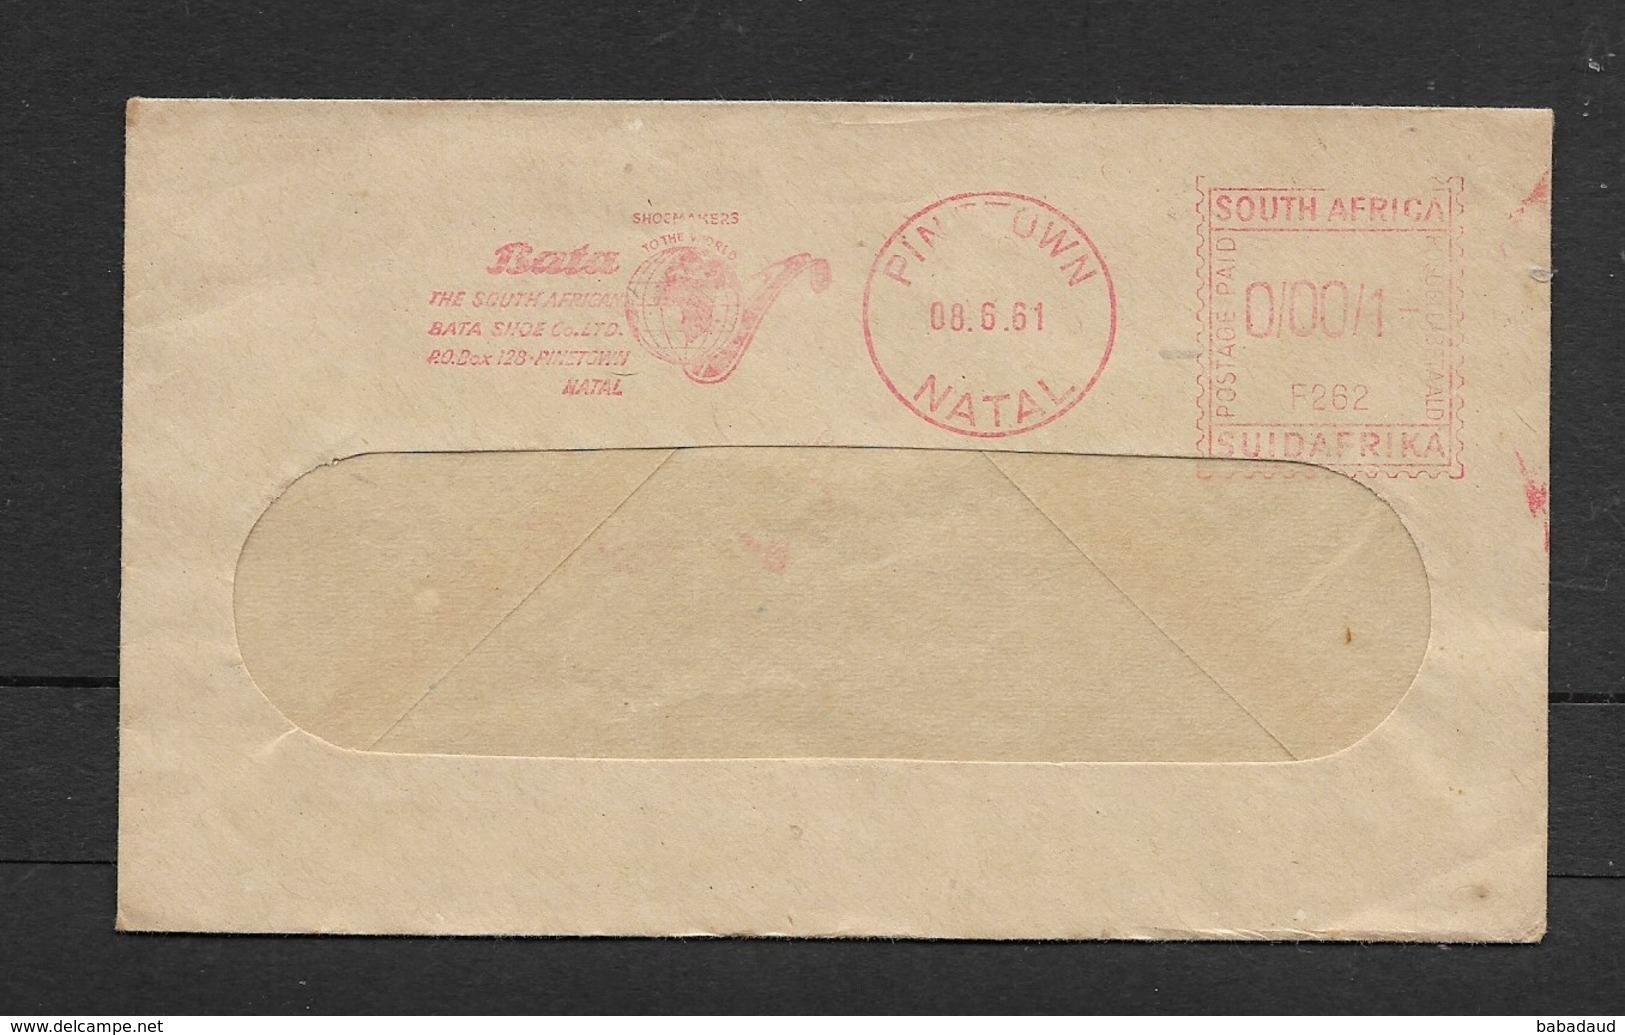 S.Africa,window Envelope, Bata Shoe Co., 1c Meter Frank PINETOWN NATAL 08.6.61 - South Africa (1961-...)